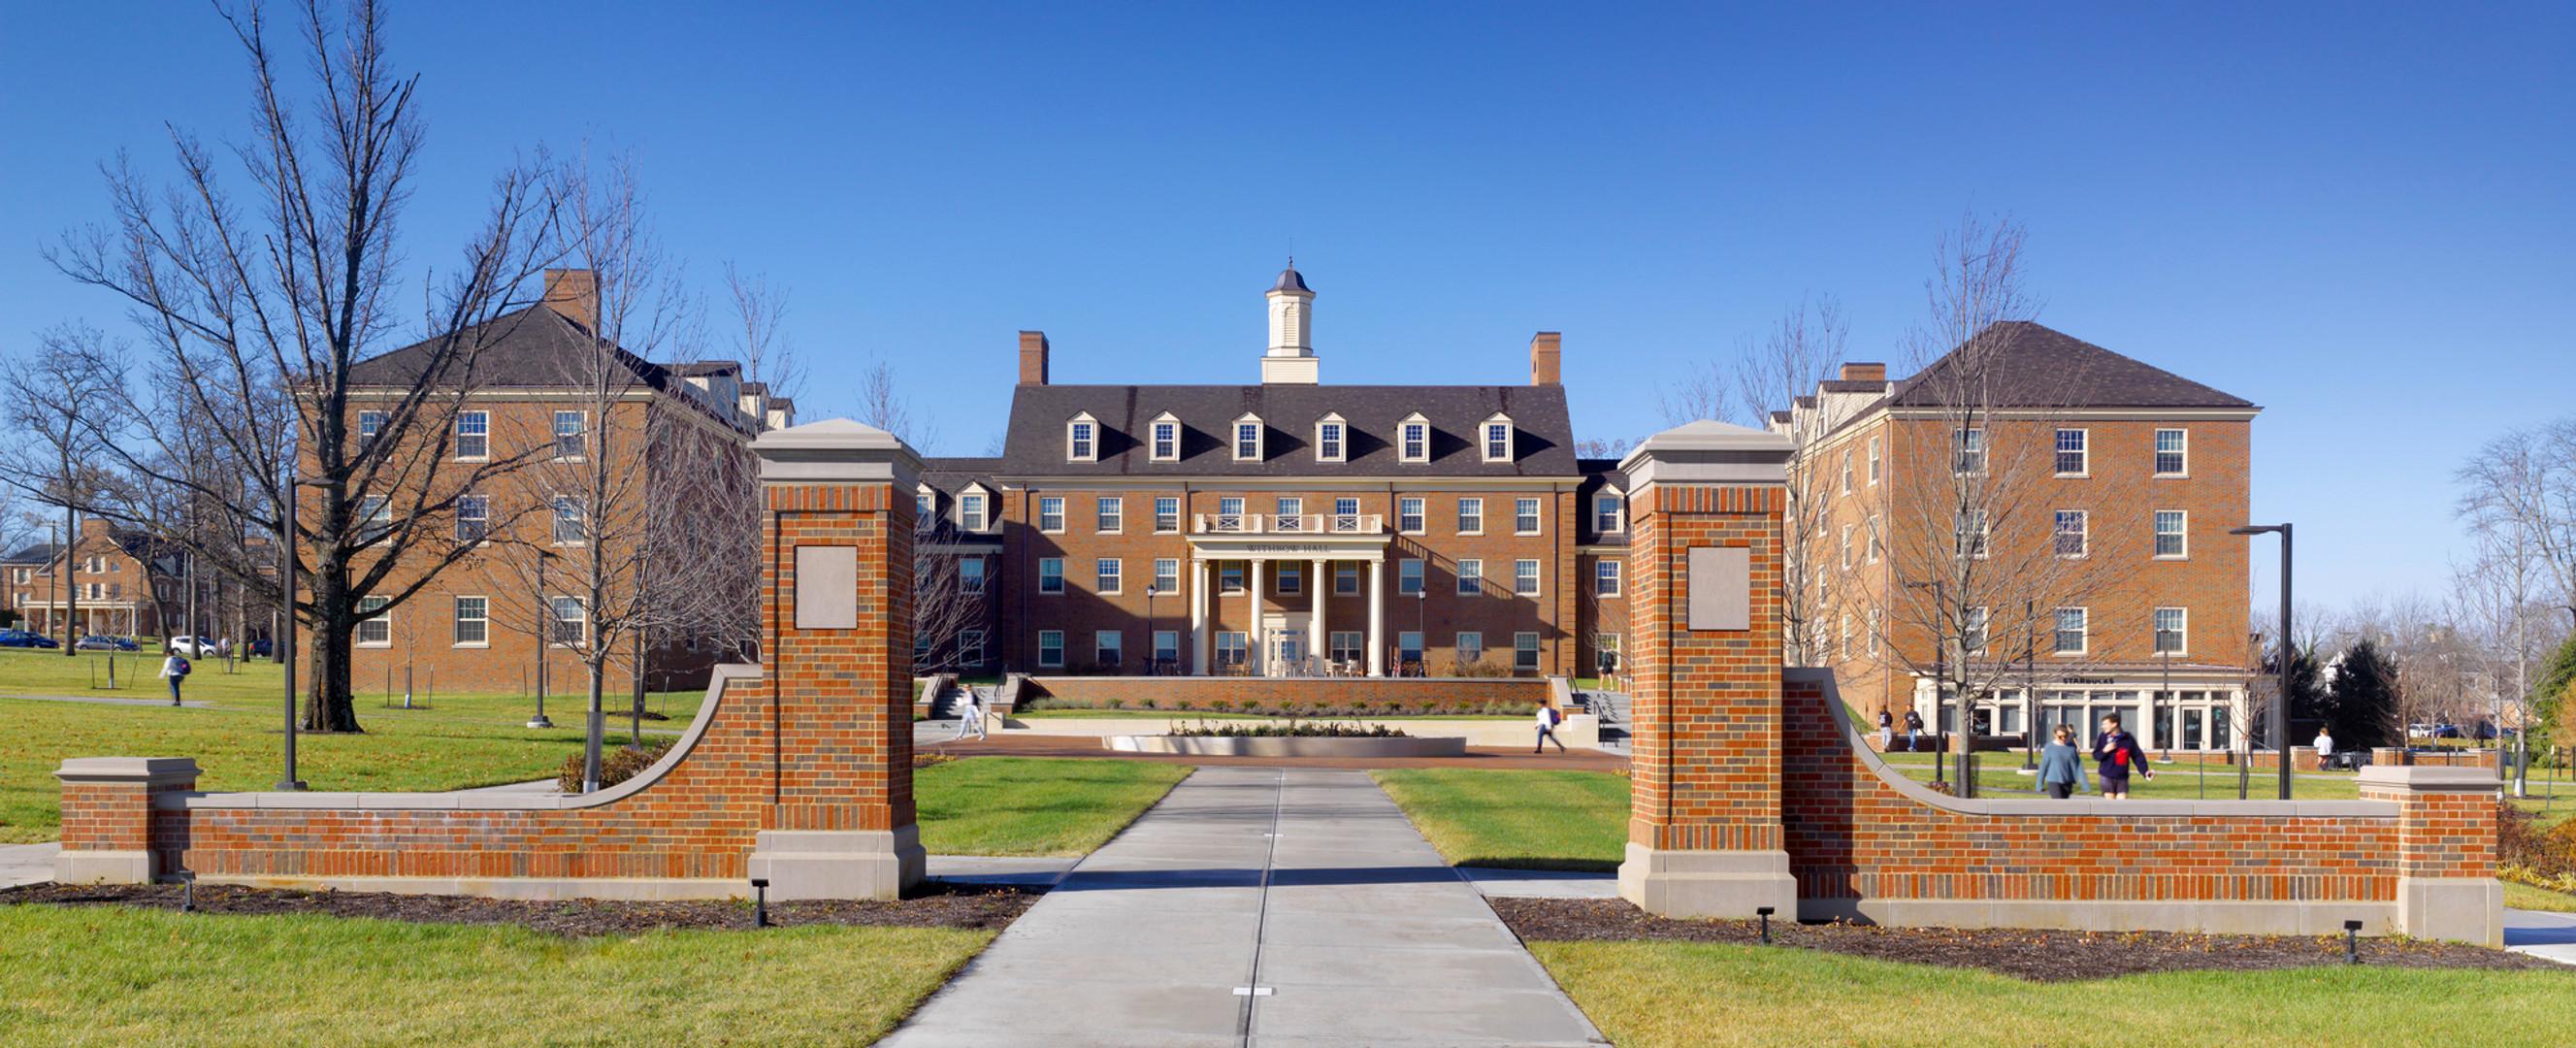 miami north campus 1.jpg